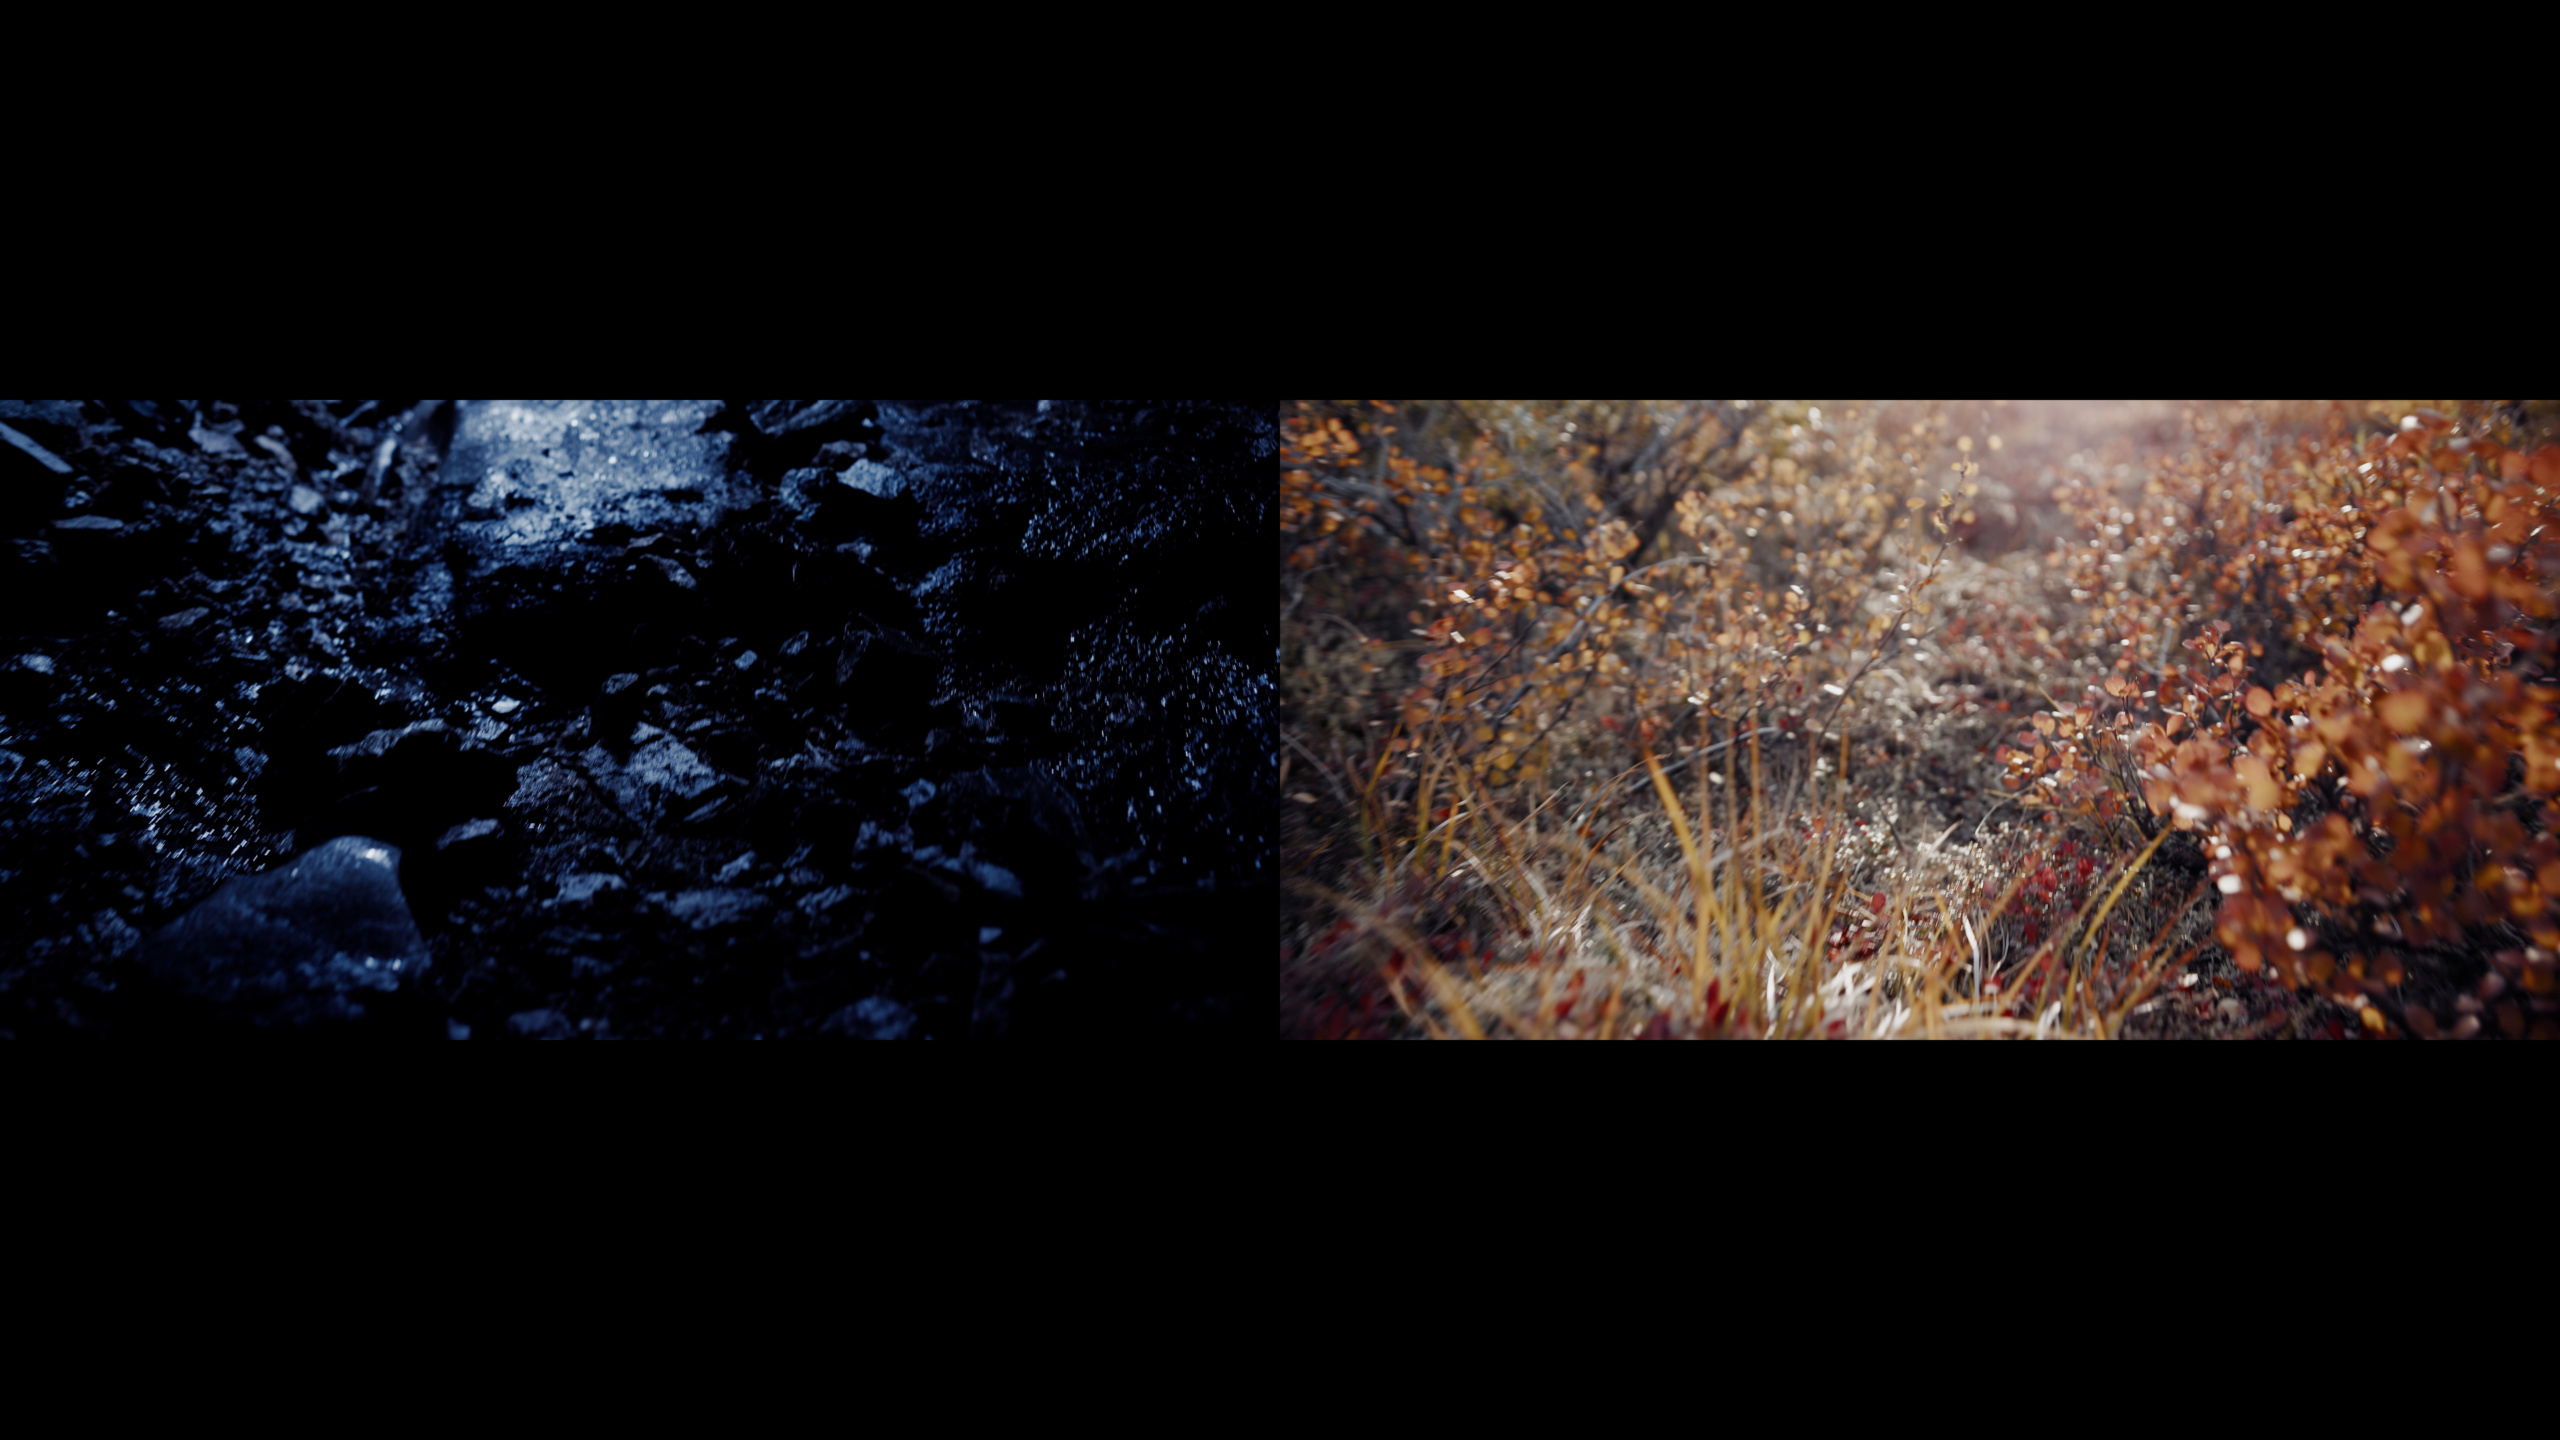 Rachel Rozanski and Parham Banafsheh, Perma, 2020, video still